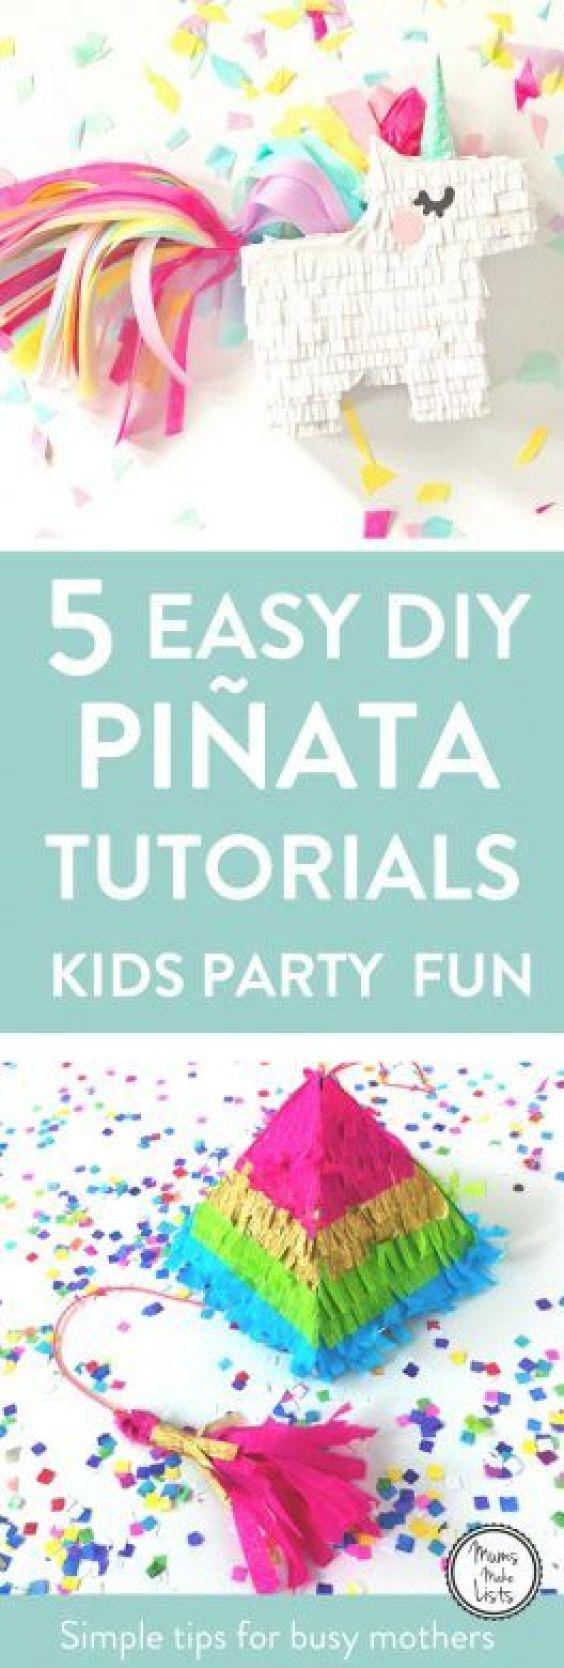 DIY Piñata tutorials - 5 brilliant tutorials on how to make a homemade piñata.These ideas are all perfect for kids birthday party piñatas. #pinata #KidsParty #KidsPartyideas #childrensparty #childrenspartyideas